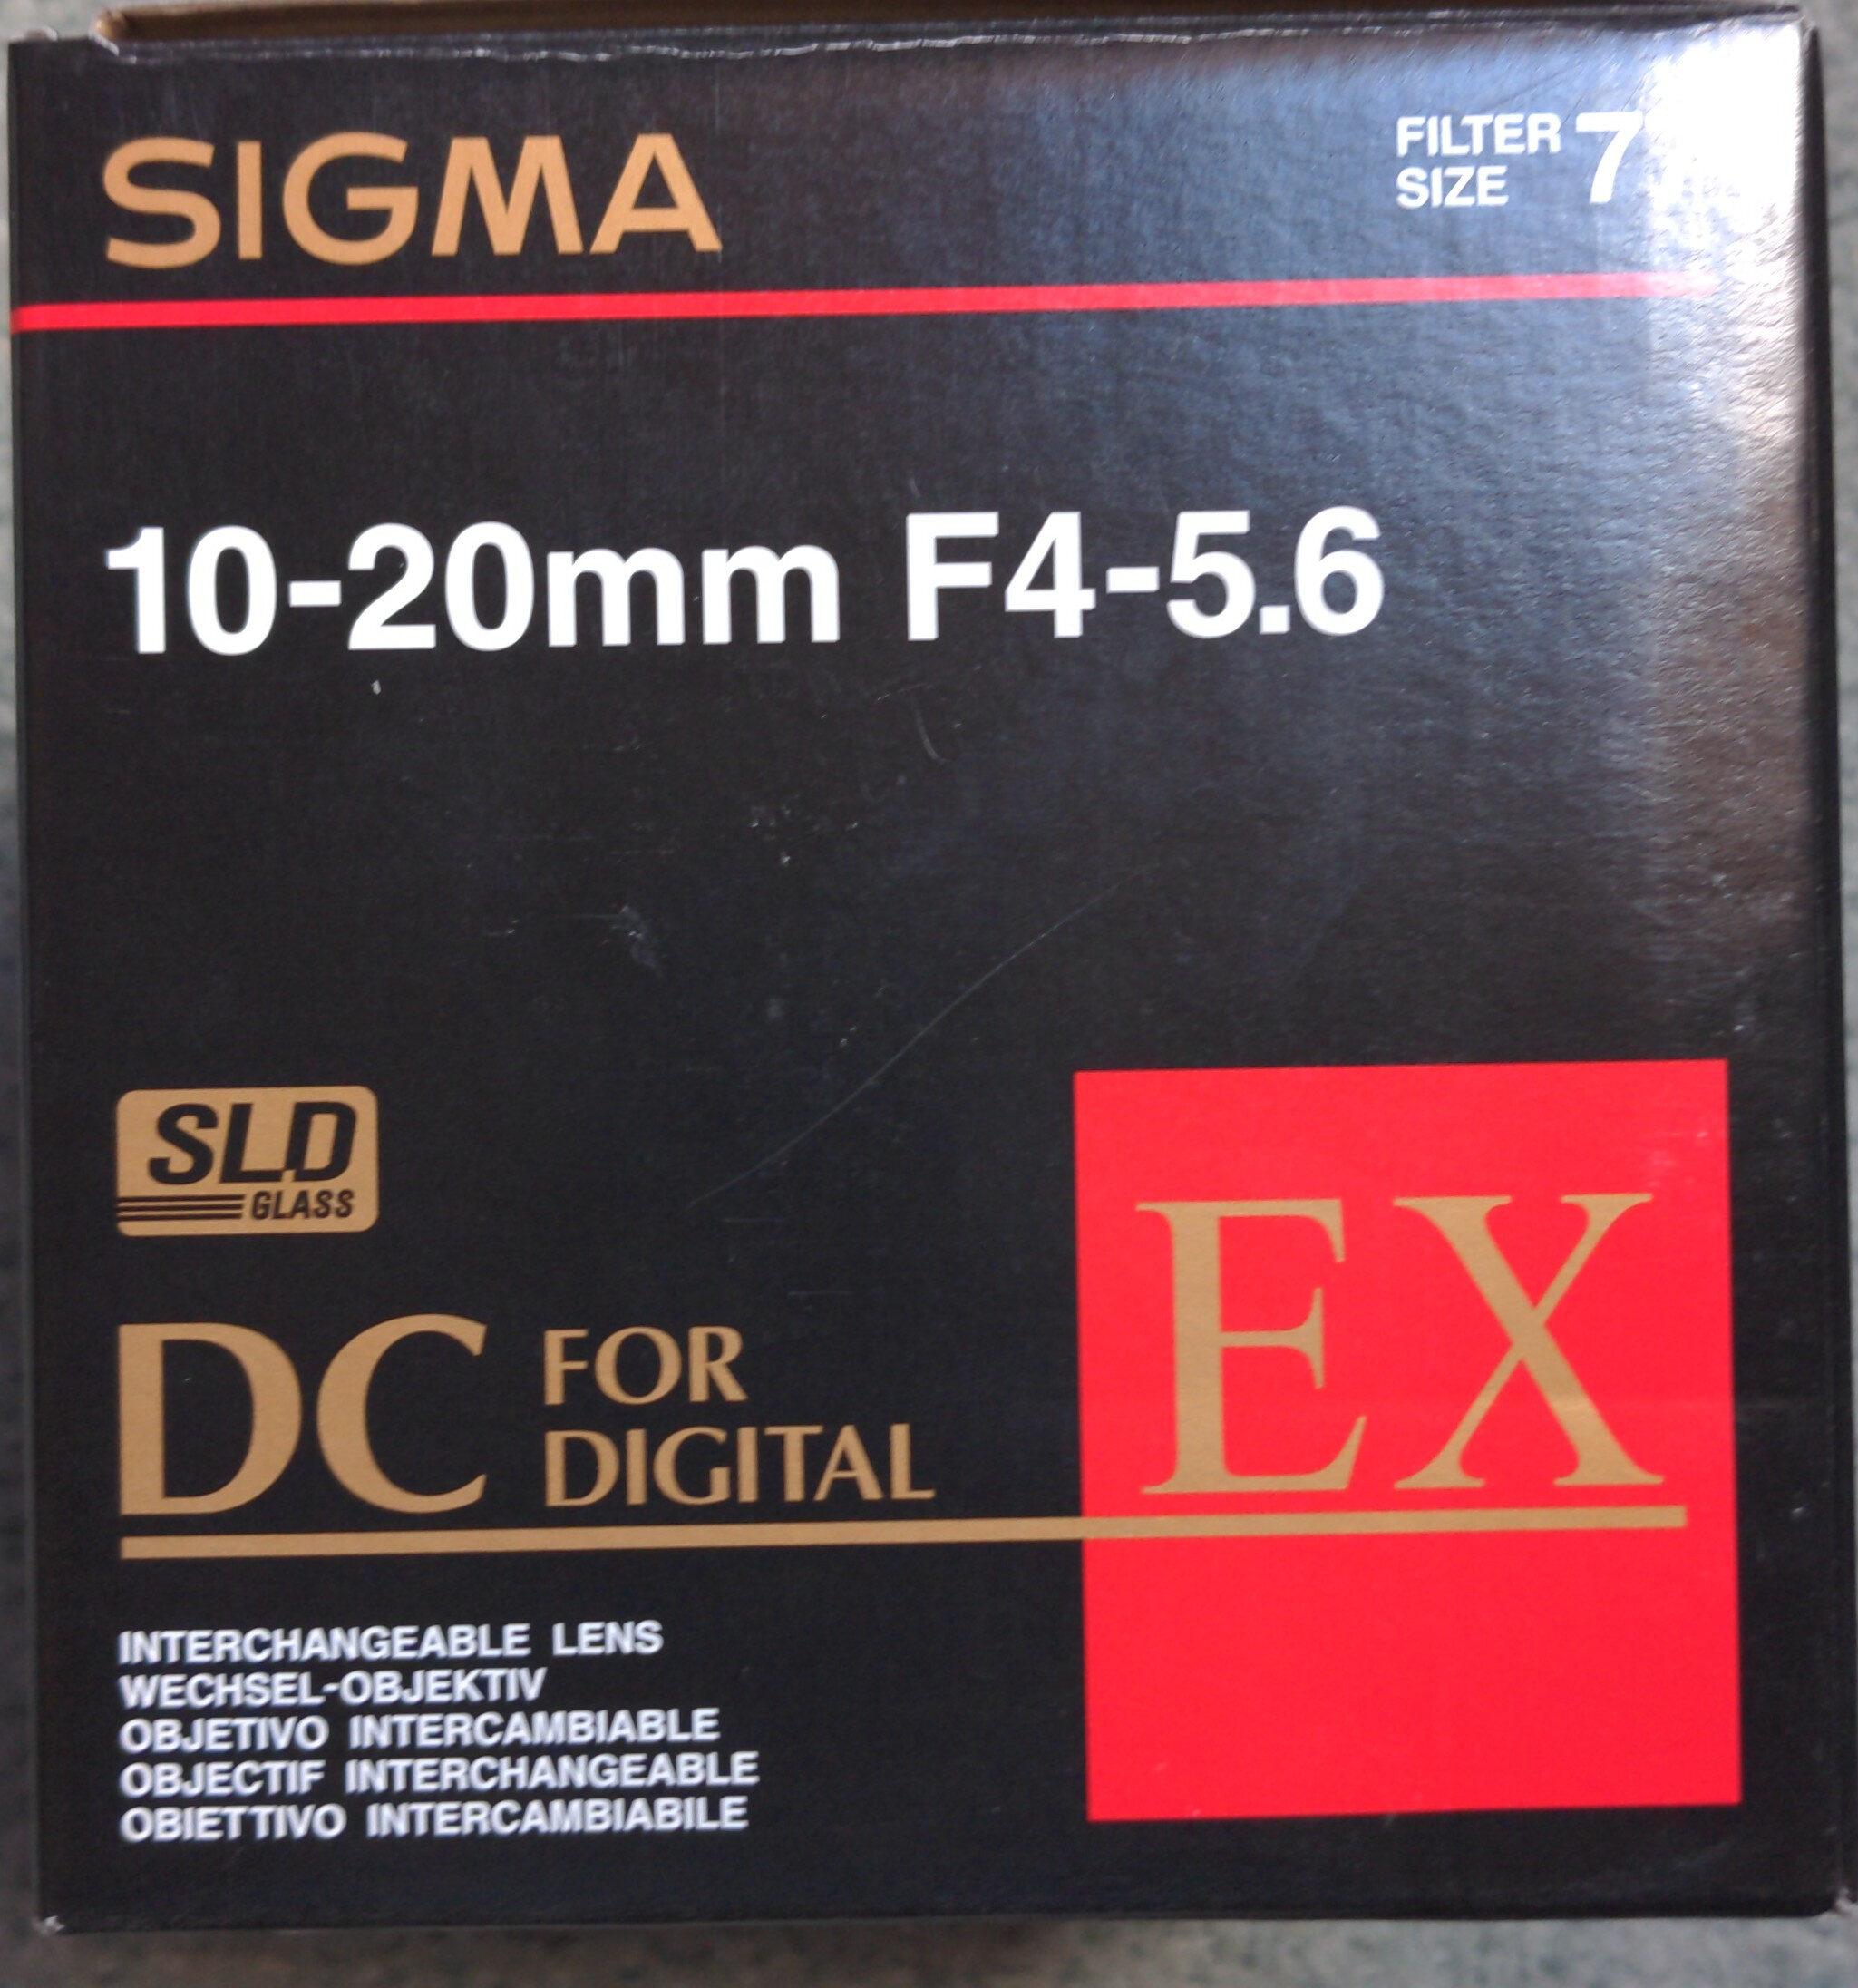 10-20mm F4-5.6 - Product - en